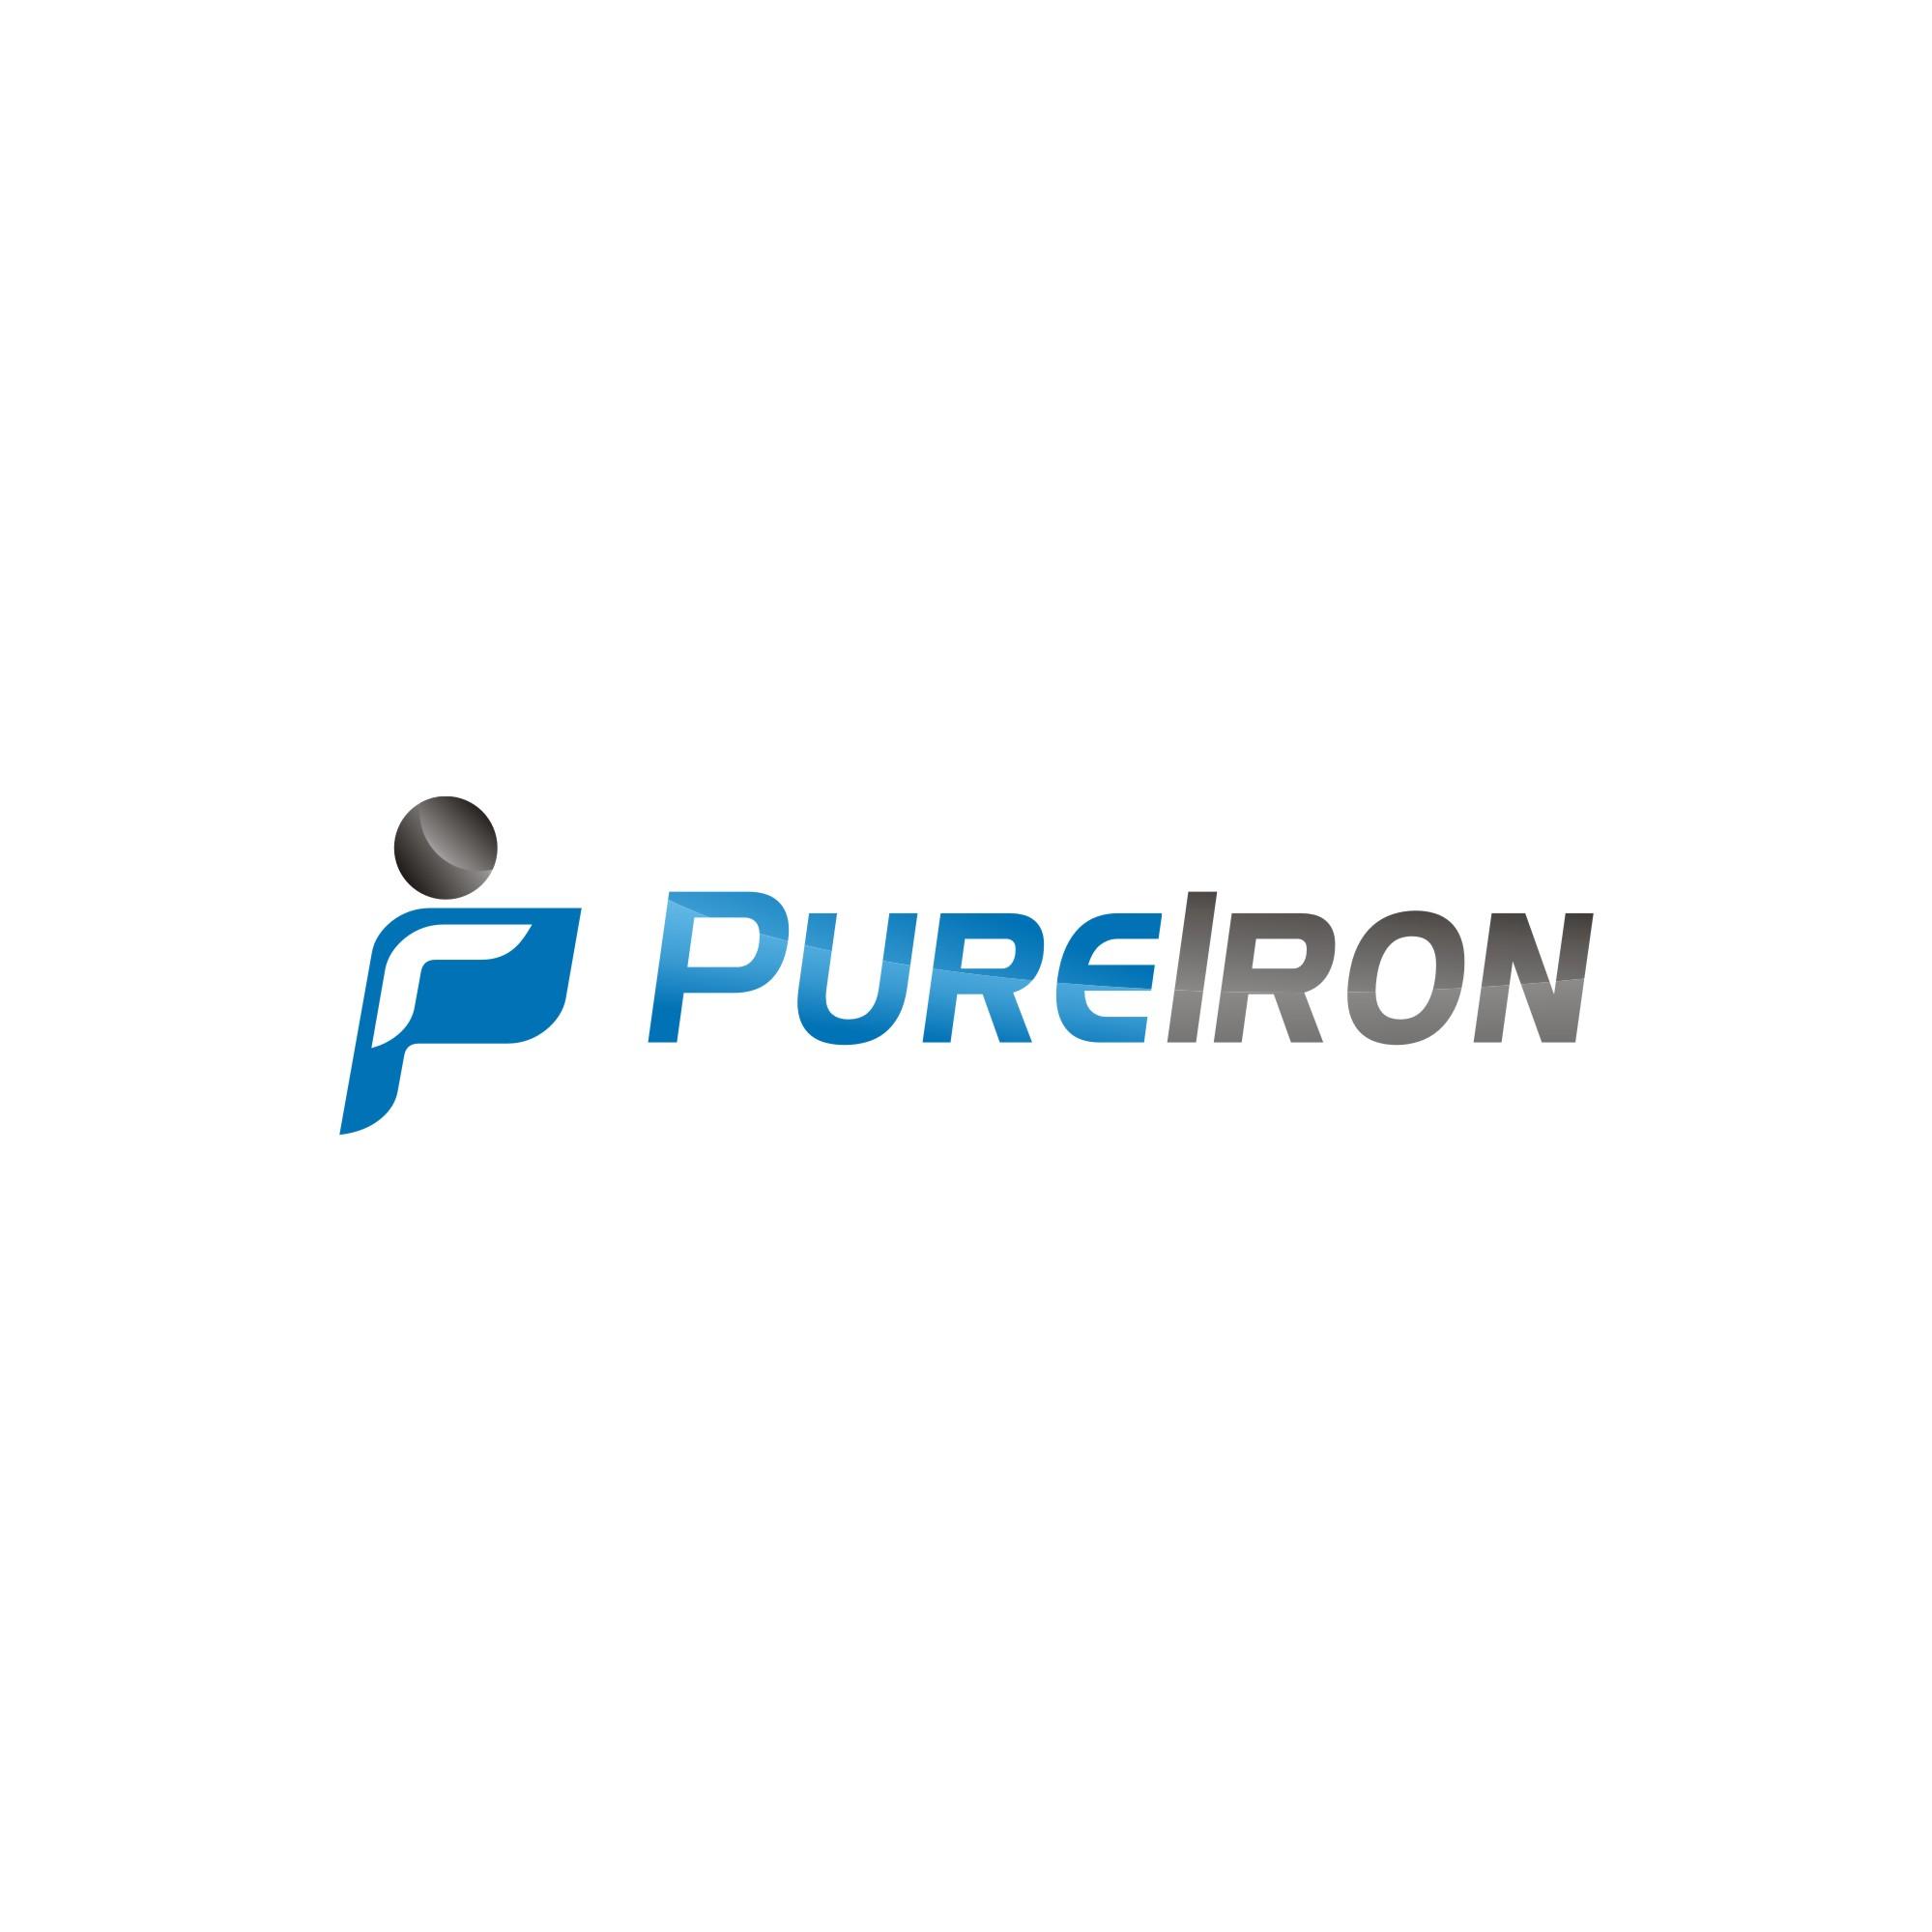 Logo Design by jalal - Entry No. 75 in the Logo Design Contest Fun Logo Design for Pure Iron.